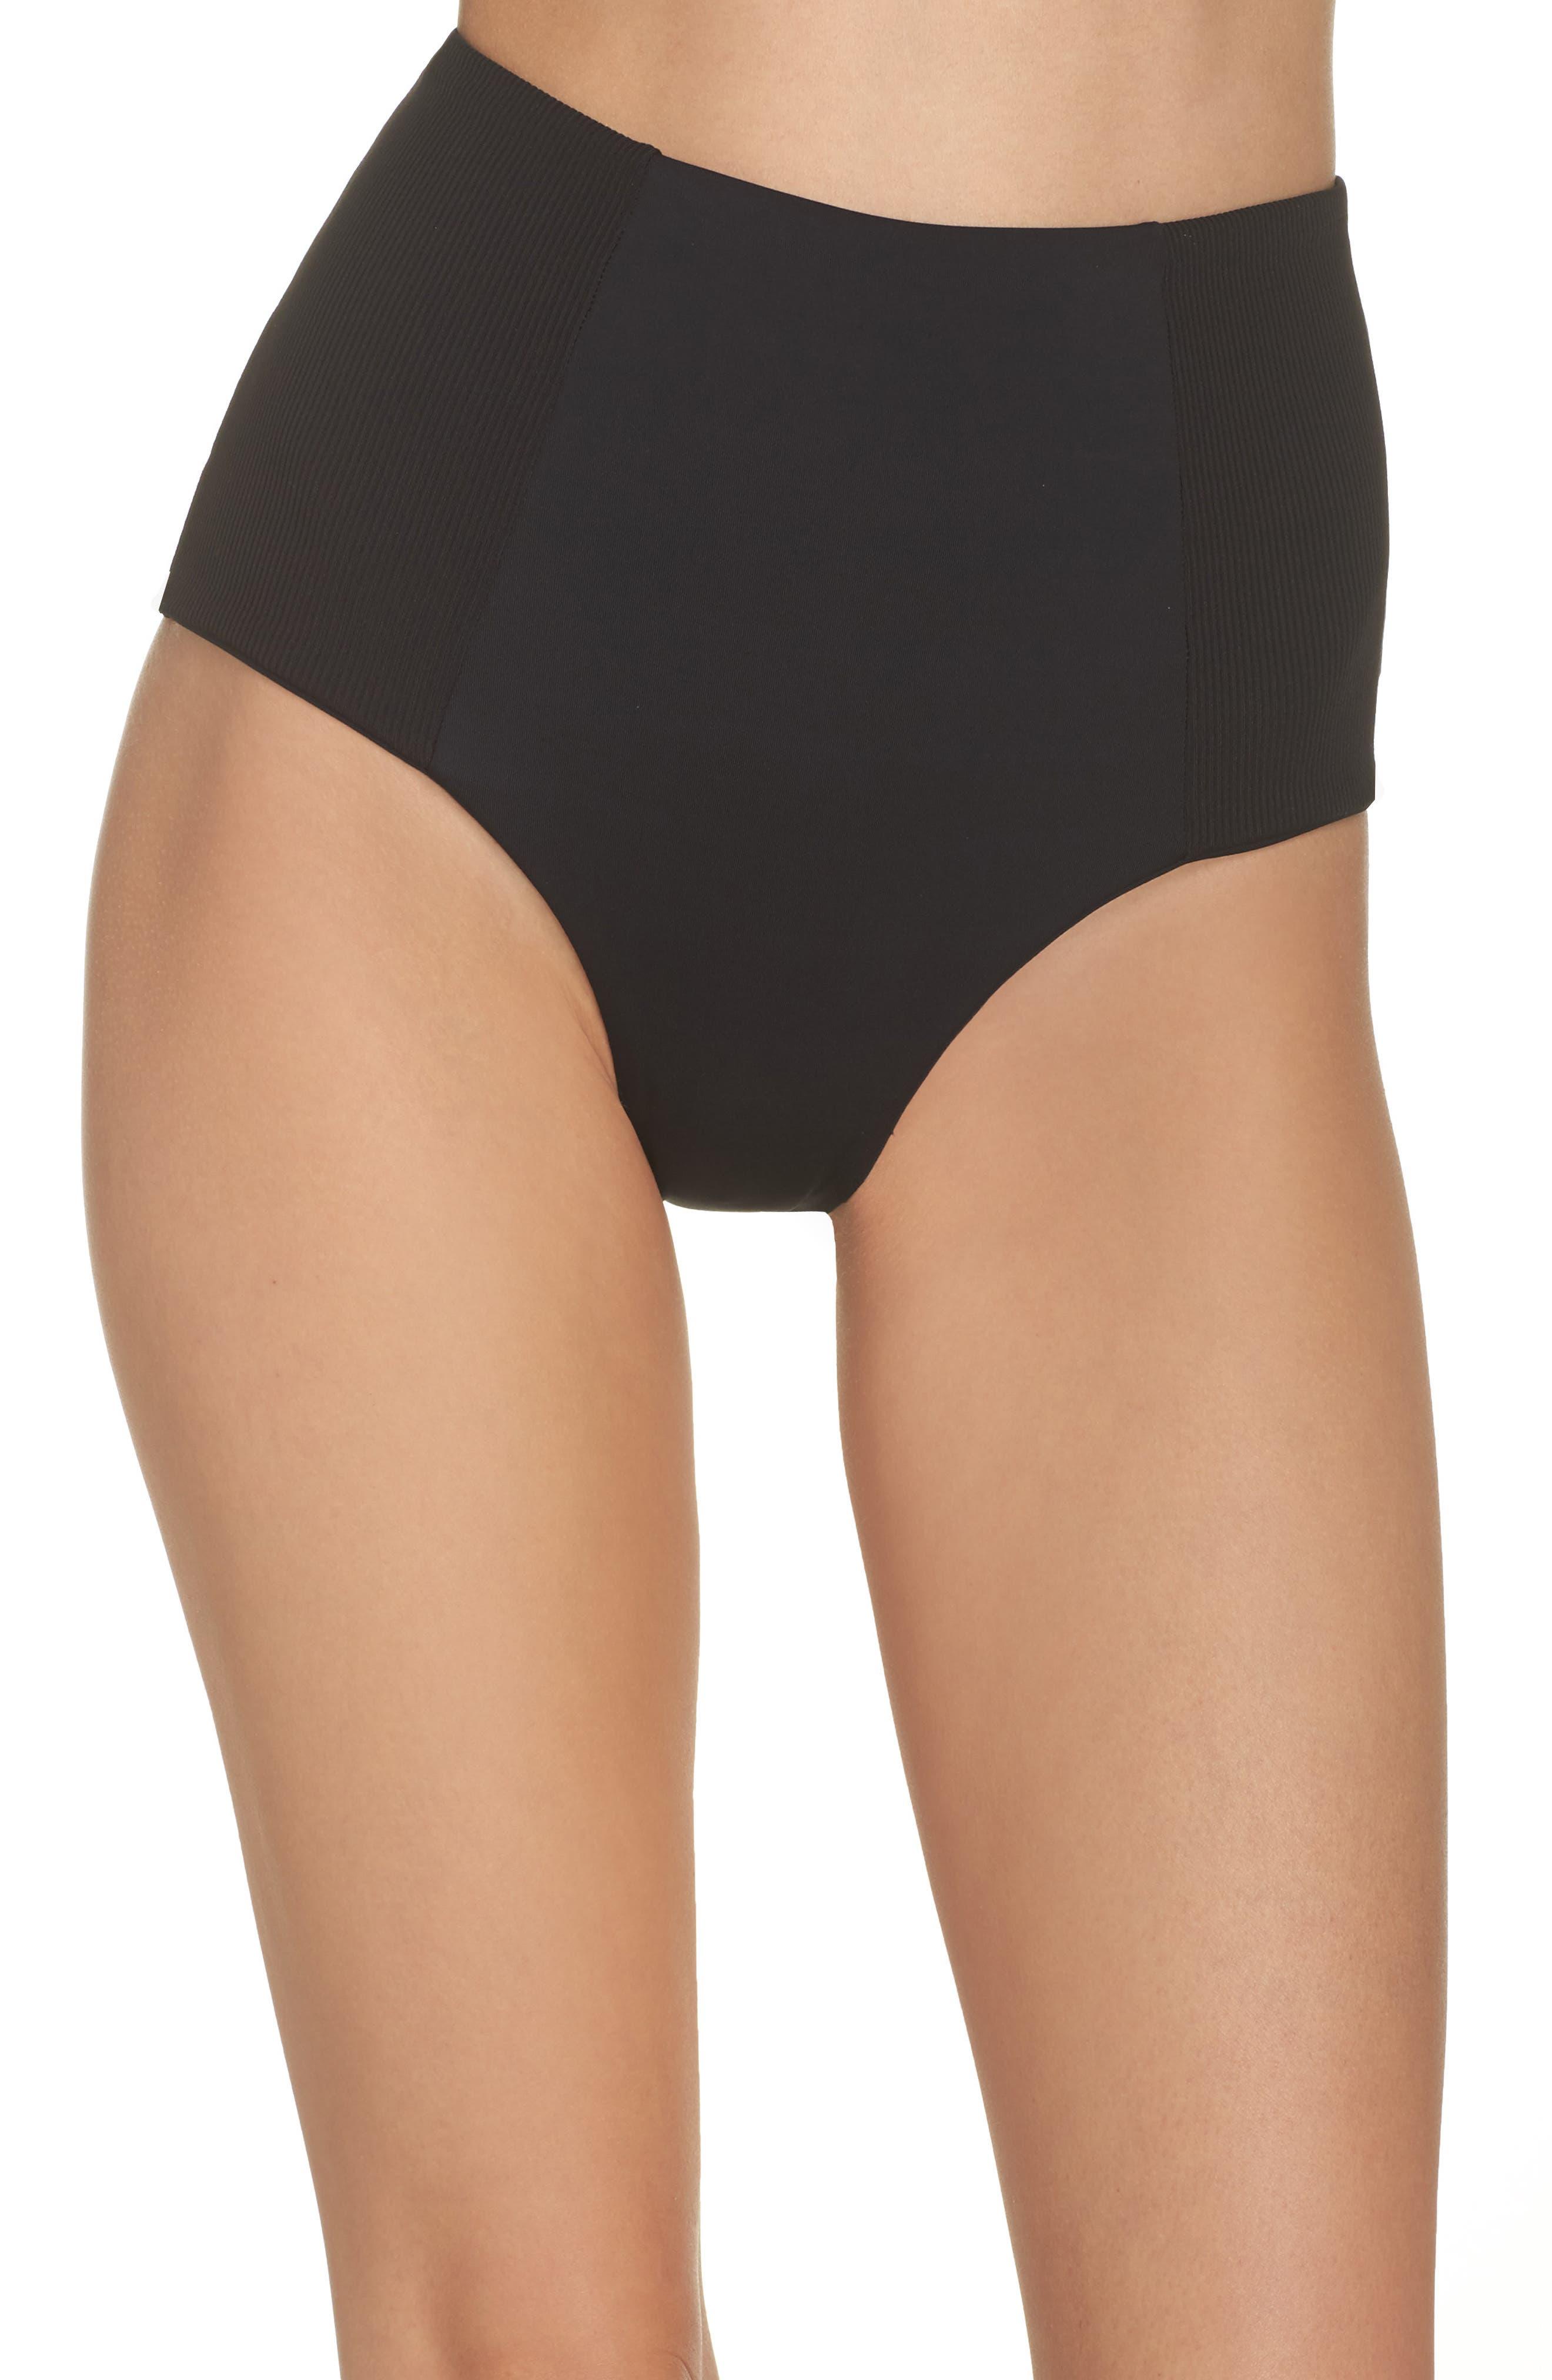 Jackie High Waist Bikini Bottoms,                             Main thumbnail 1, color,                             Black